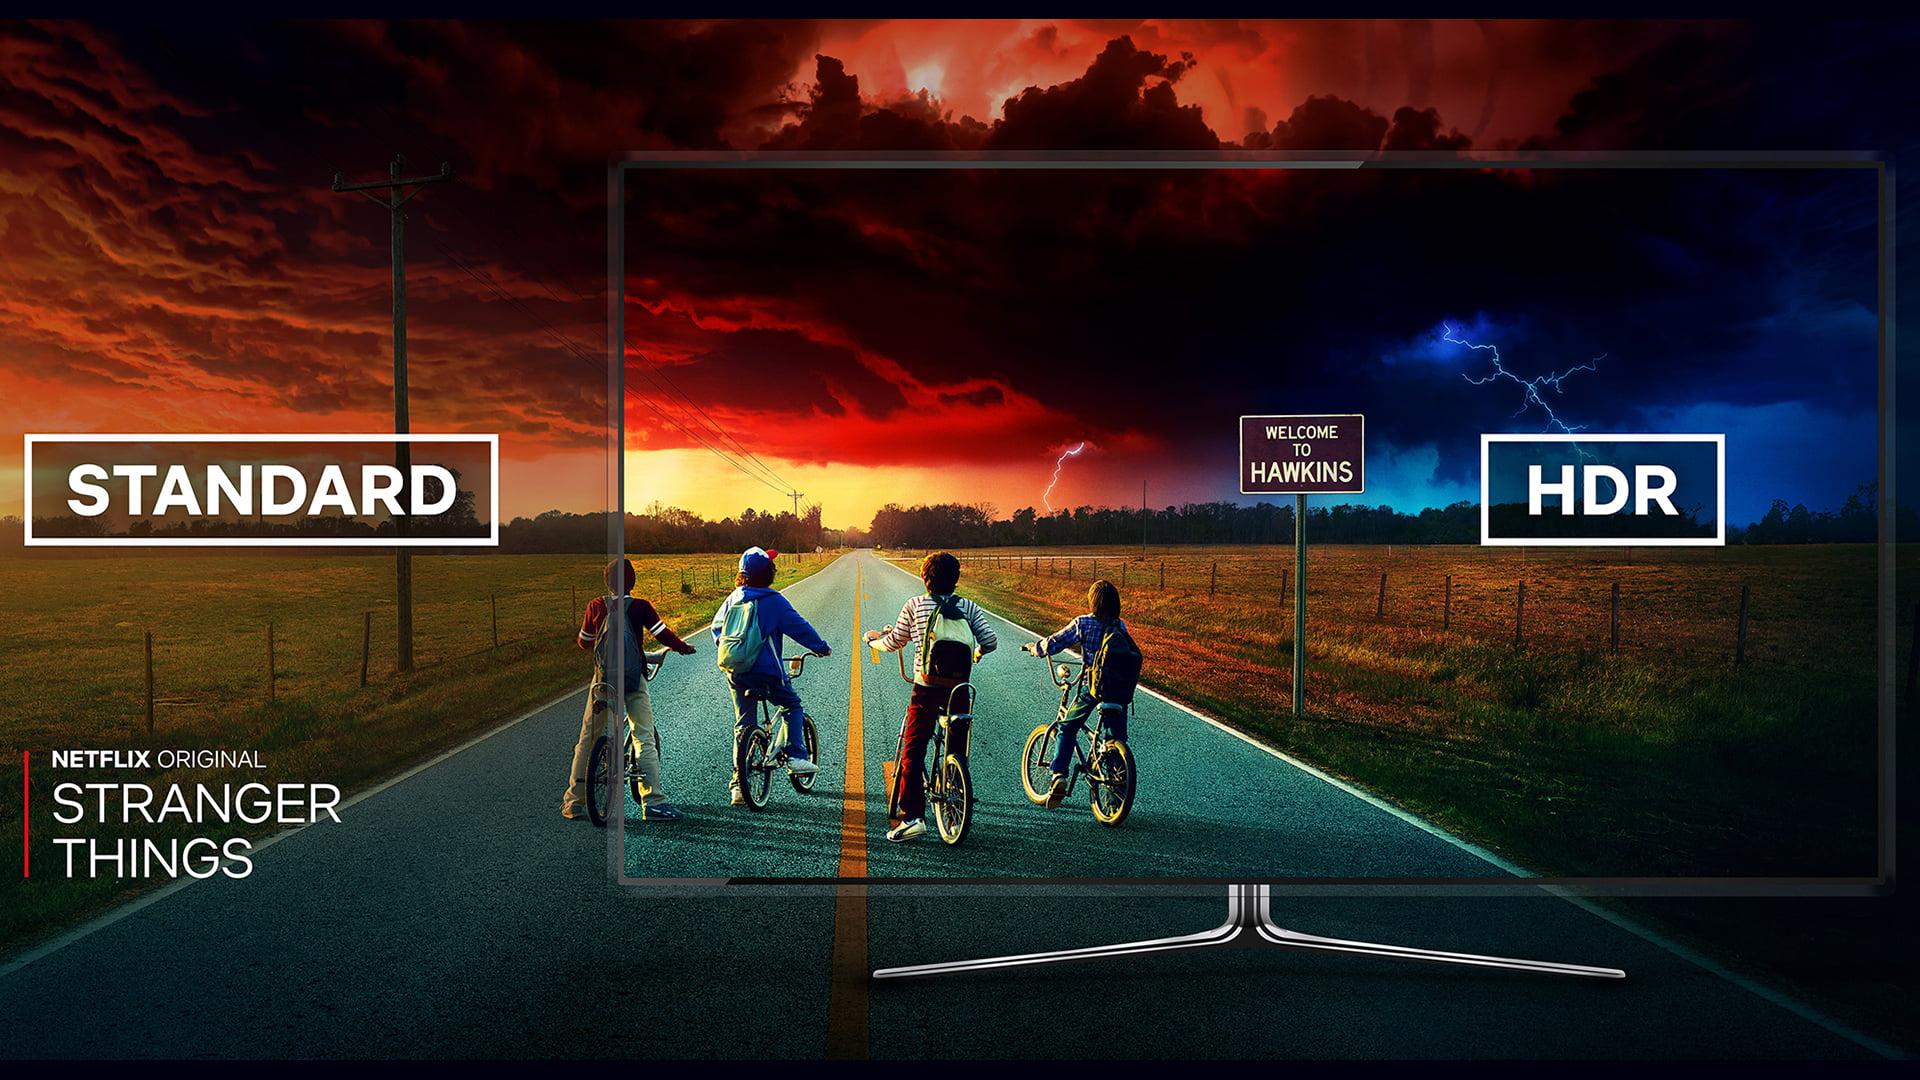 【觀點】Chromecast 看 Netflix 4K HDR?不如一開始便選 Android TV 智能電視 ...